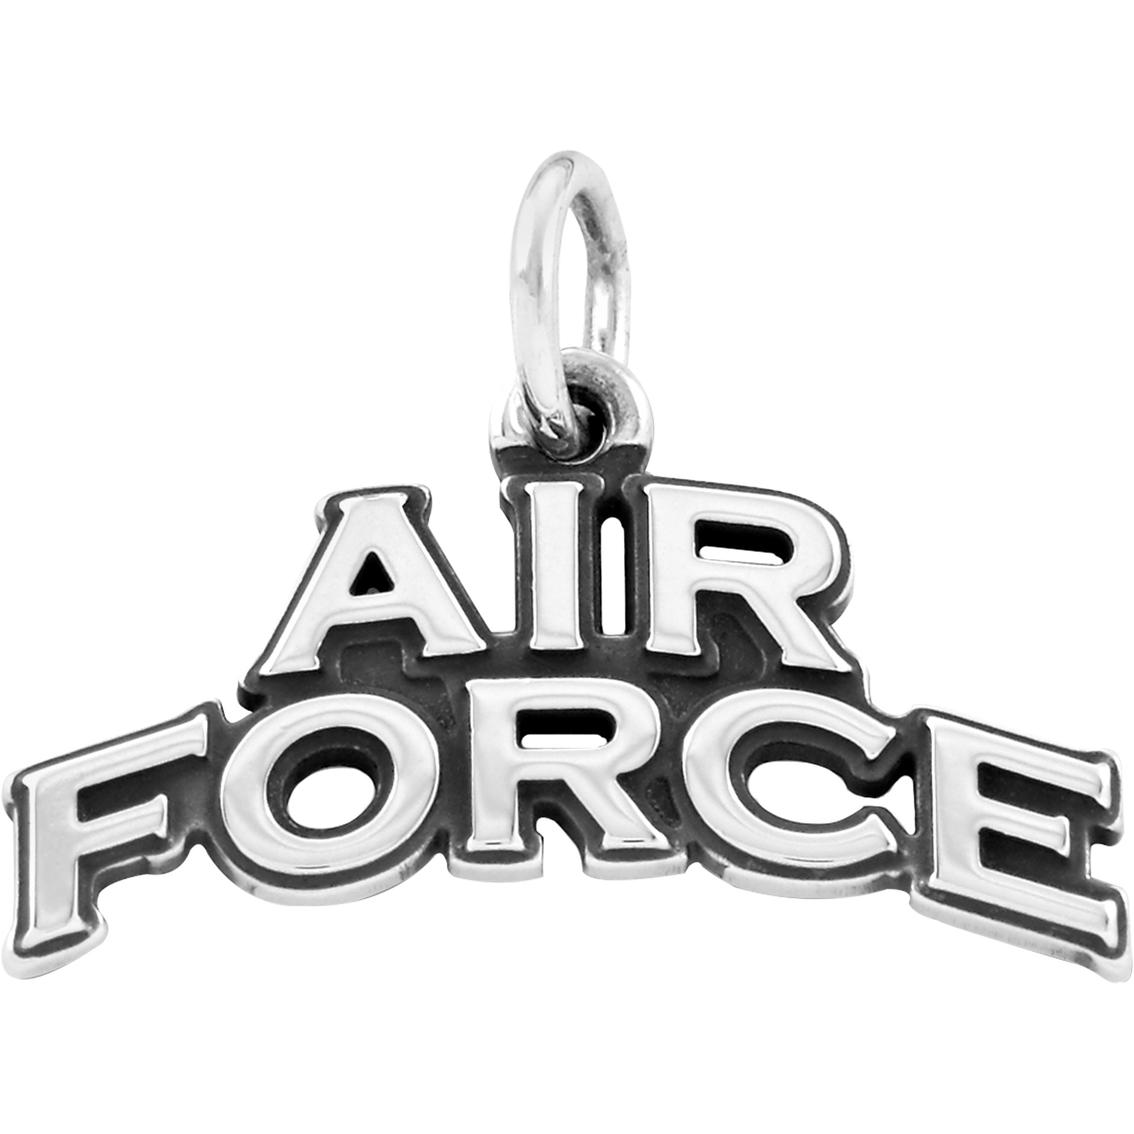 Military Charm Service Charm Pendant Charms Air Force Charm Military Charm U.S